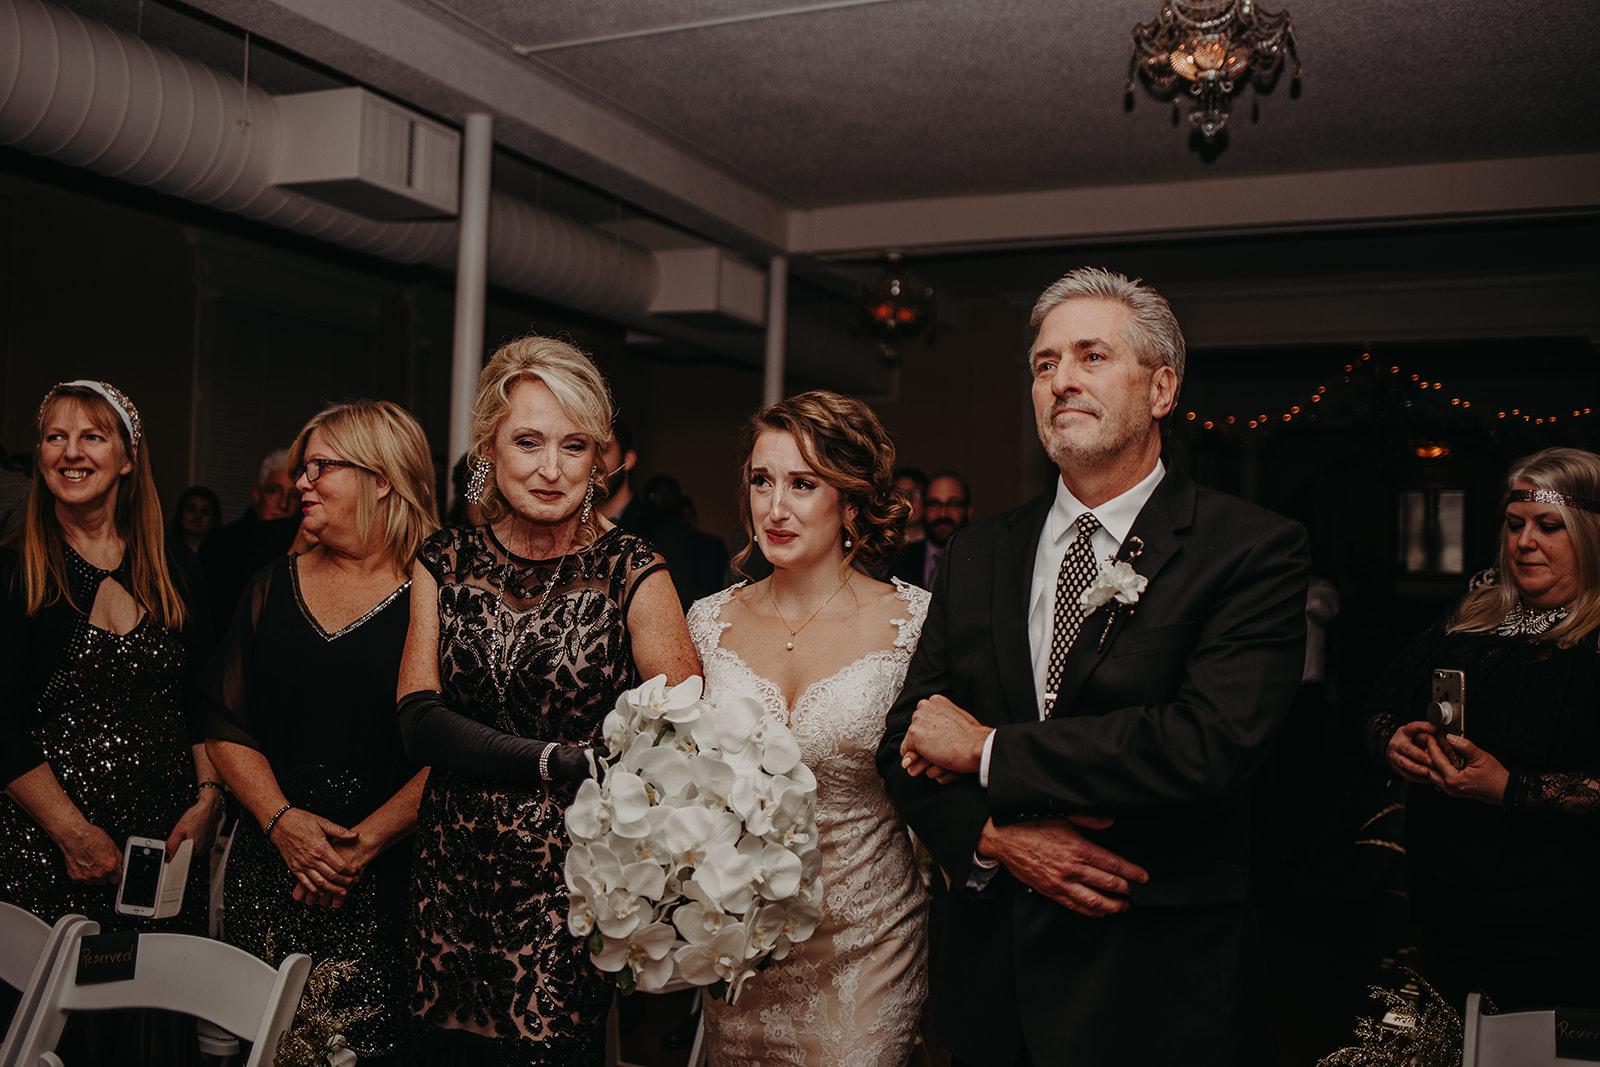 bellingham-wedding-broadway-hall-natalie-levi (46 of 143).jpg